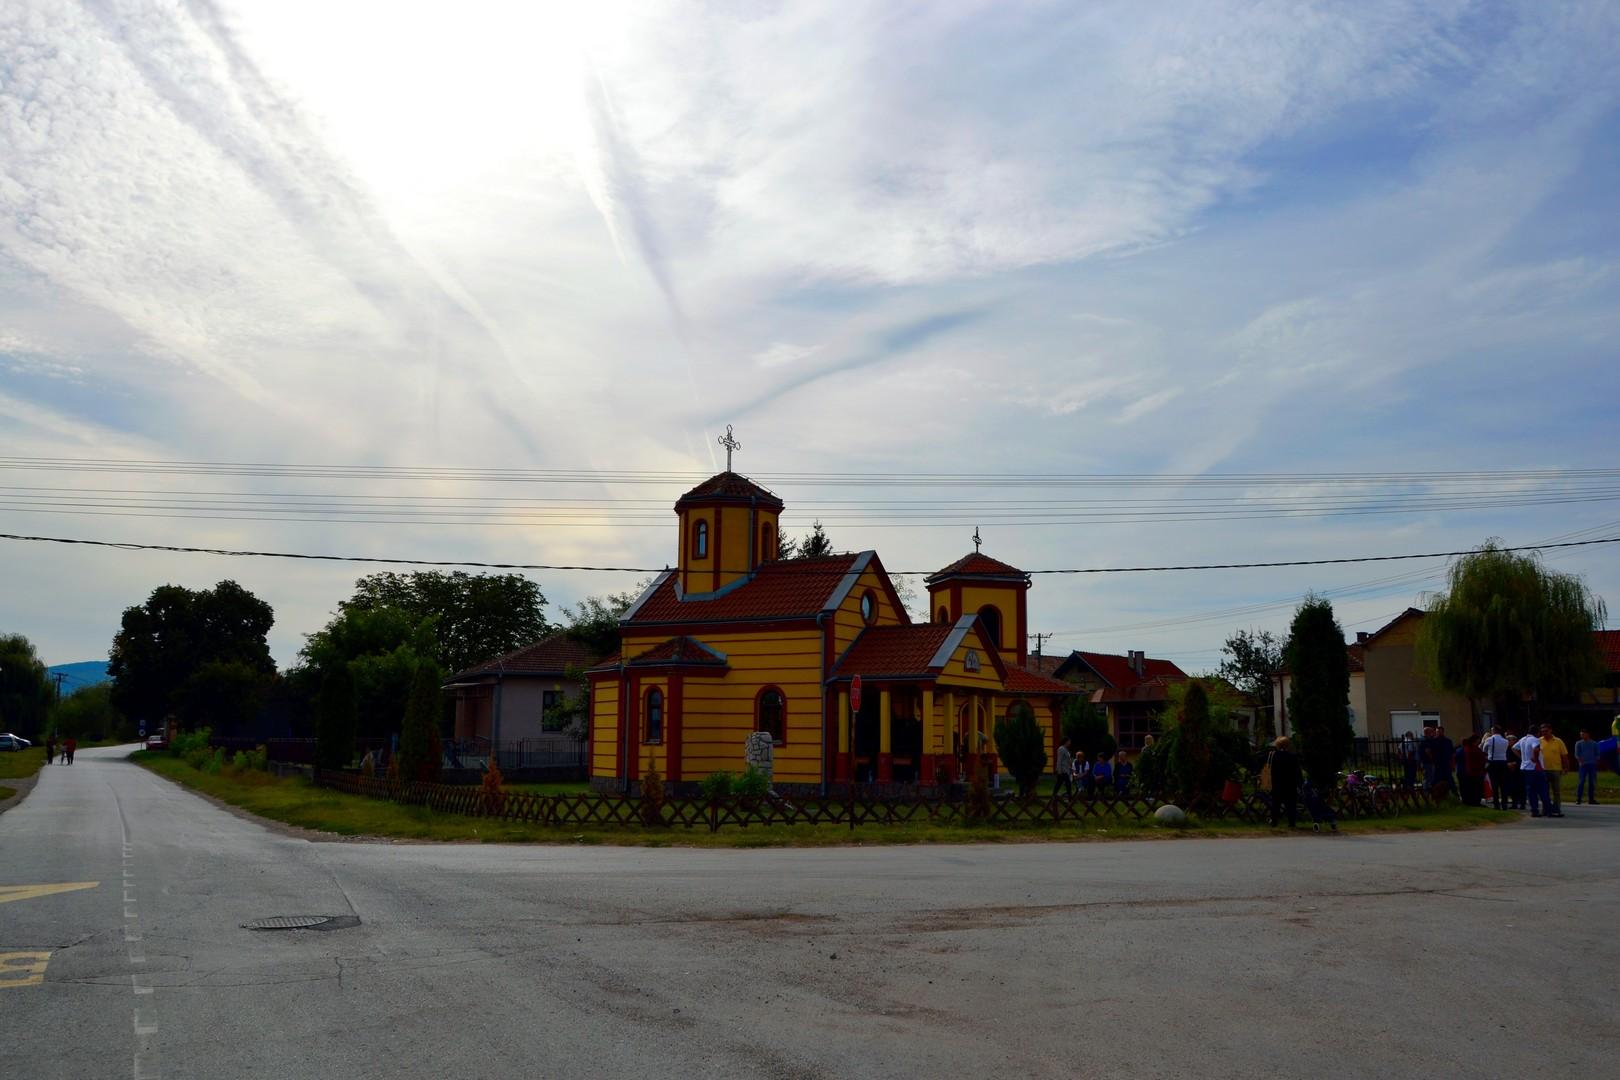 Praznik Presvete Bogorodice – Mala Gospojina u selu Poljska Ržana